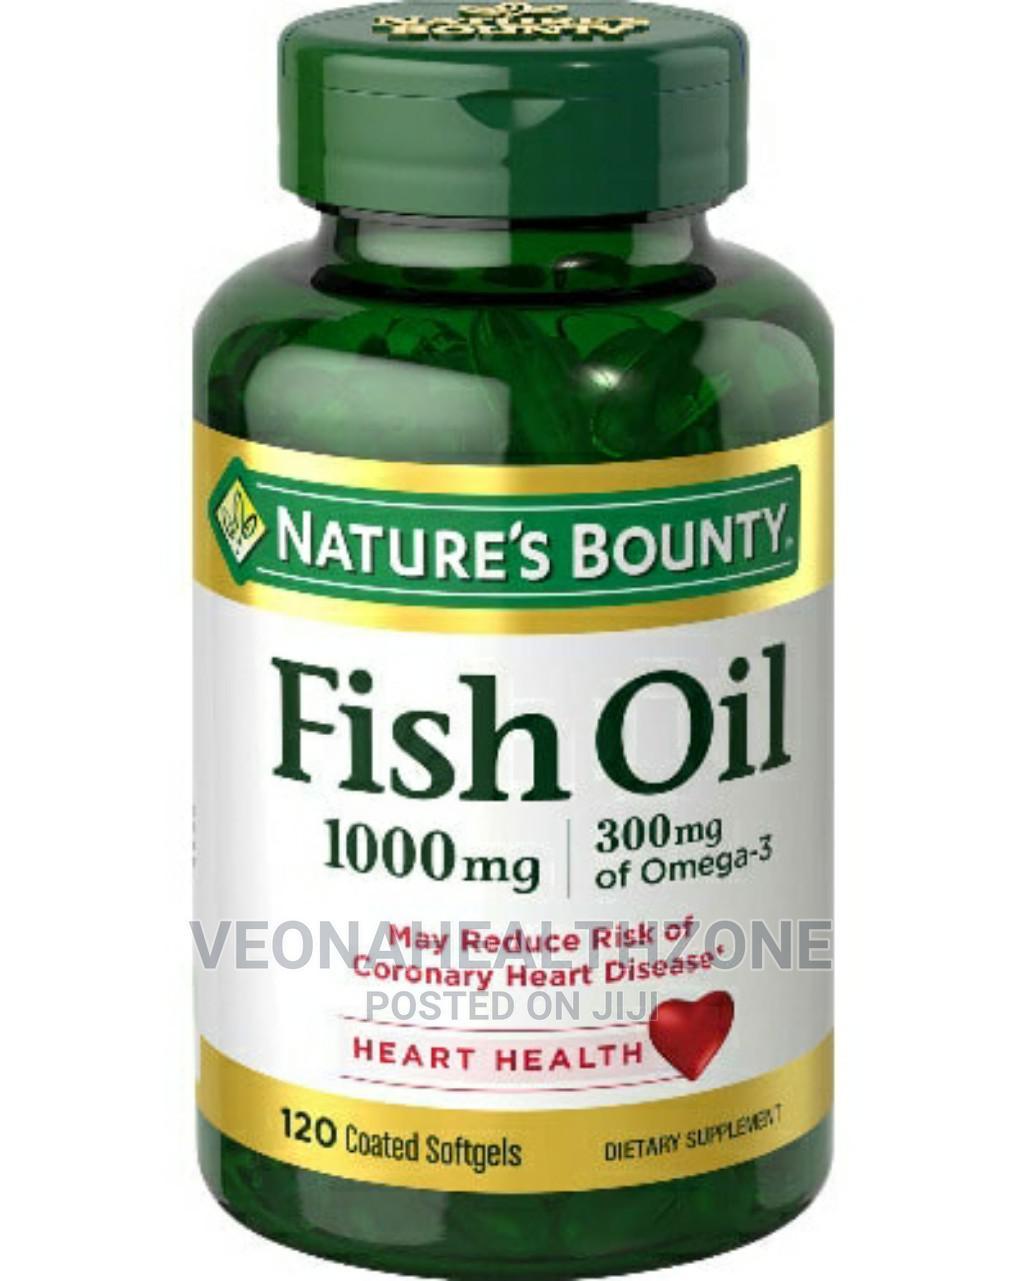 Nature's Bounty Fish Oil 1000mg Omega-3